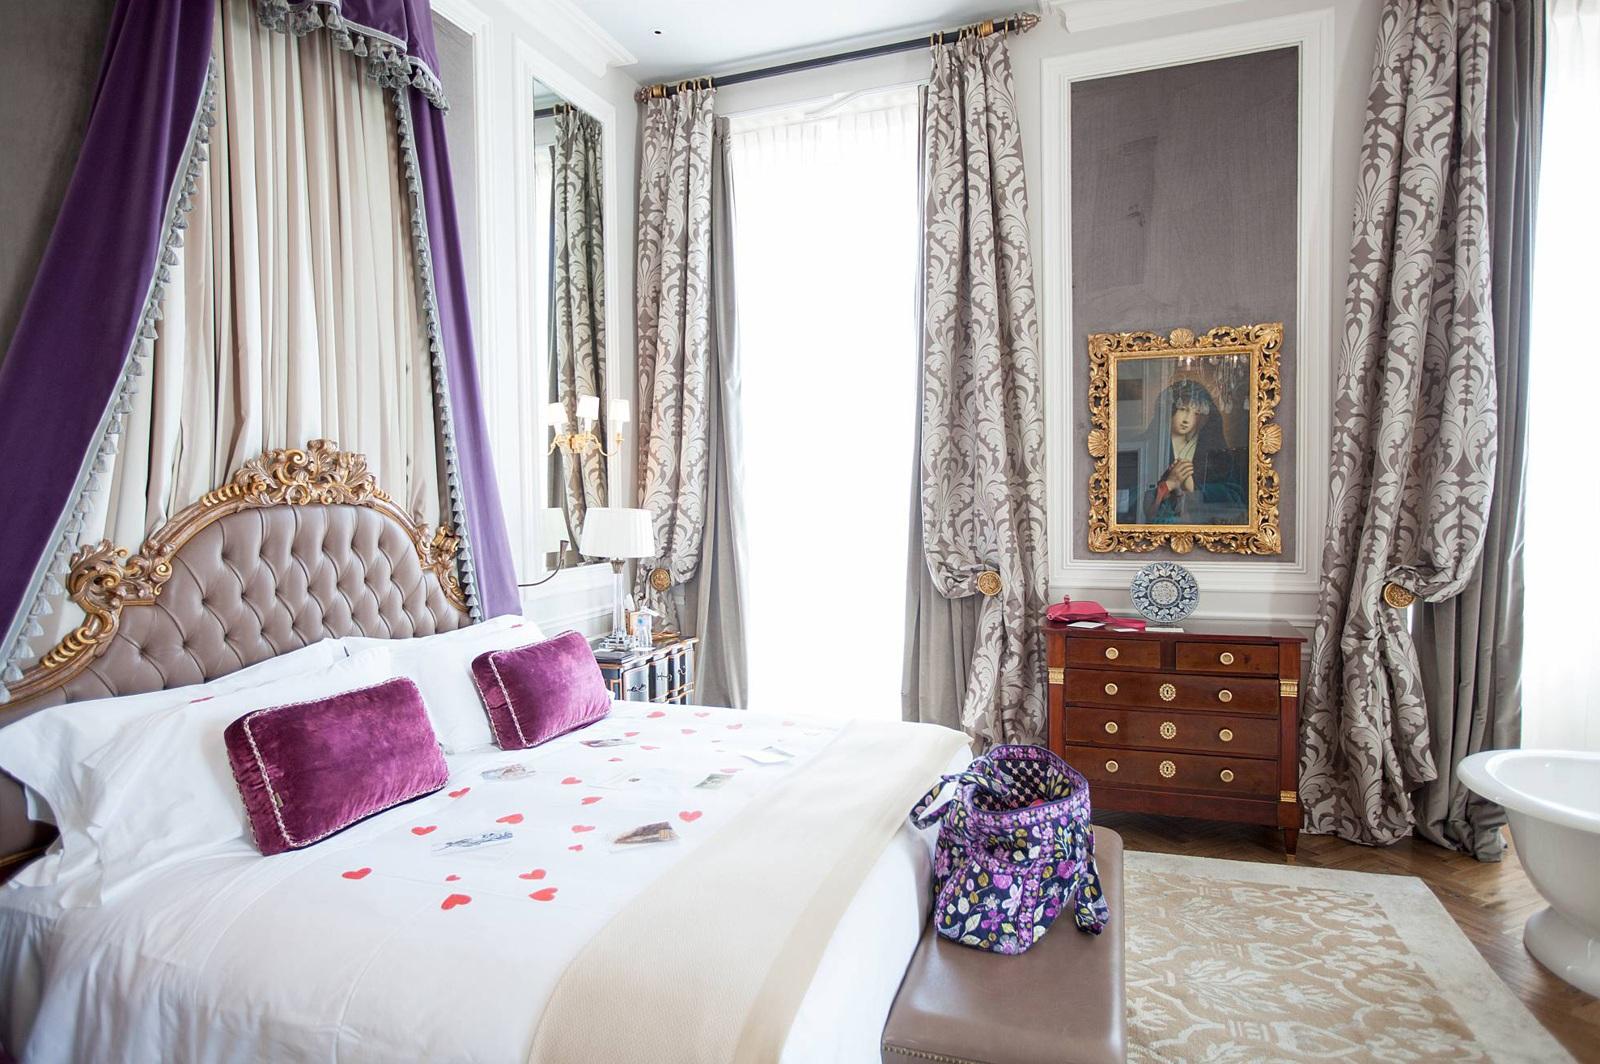 Room at St. Regis in Florence